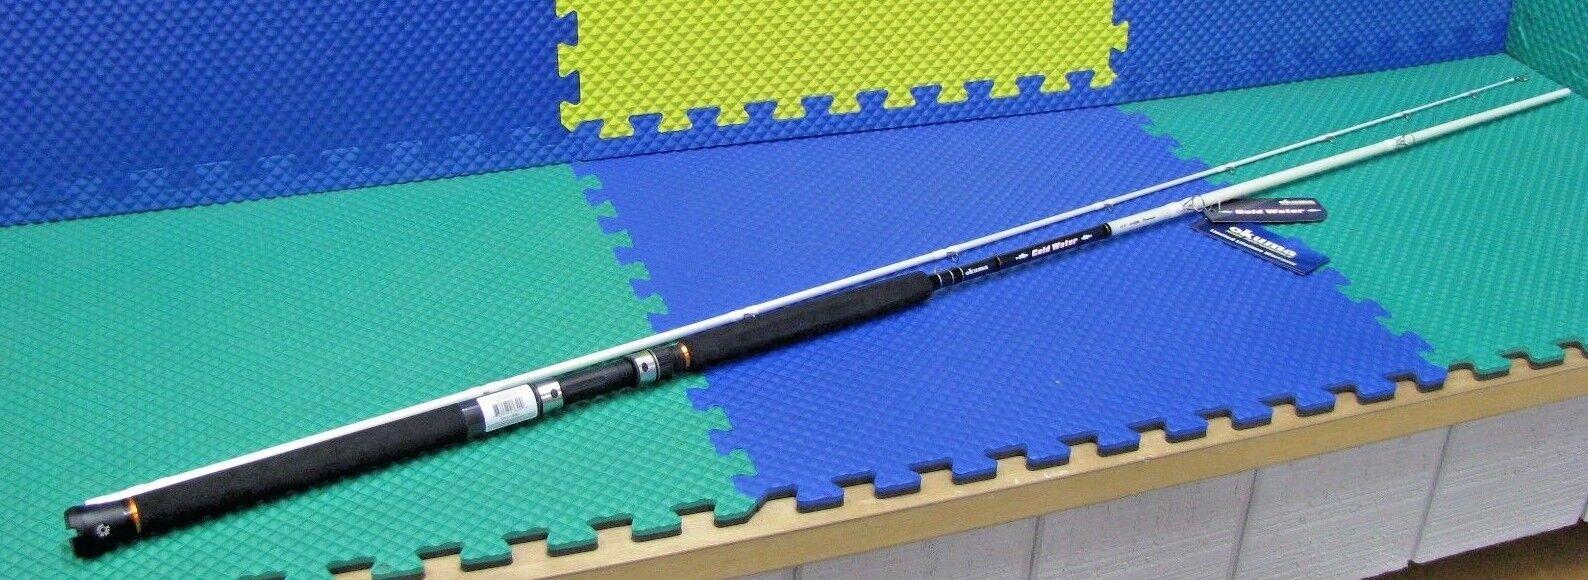 Okuma Cold Water Downrigger Trolling Rod 10' 6  M Action 2 PC CW-C-1062M